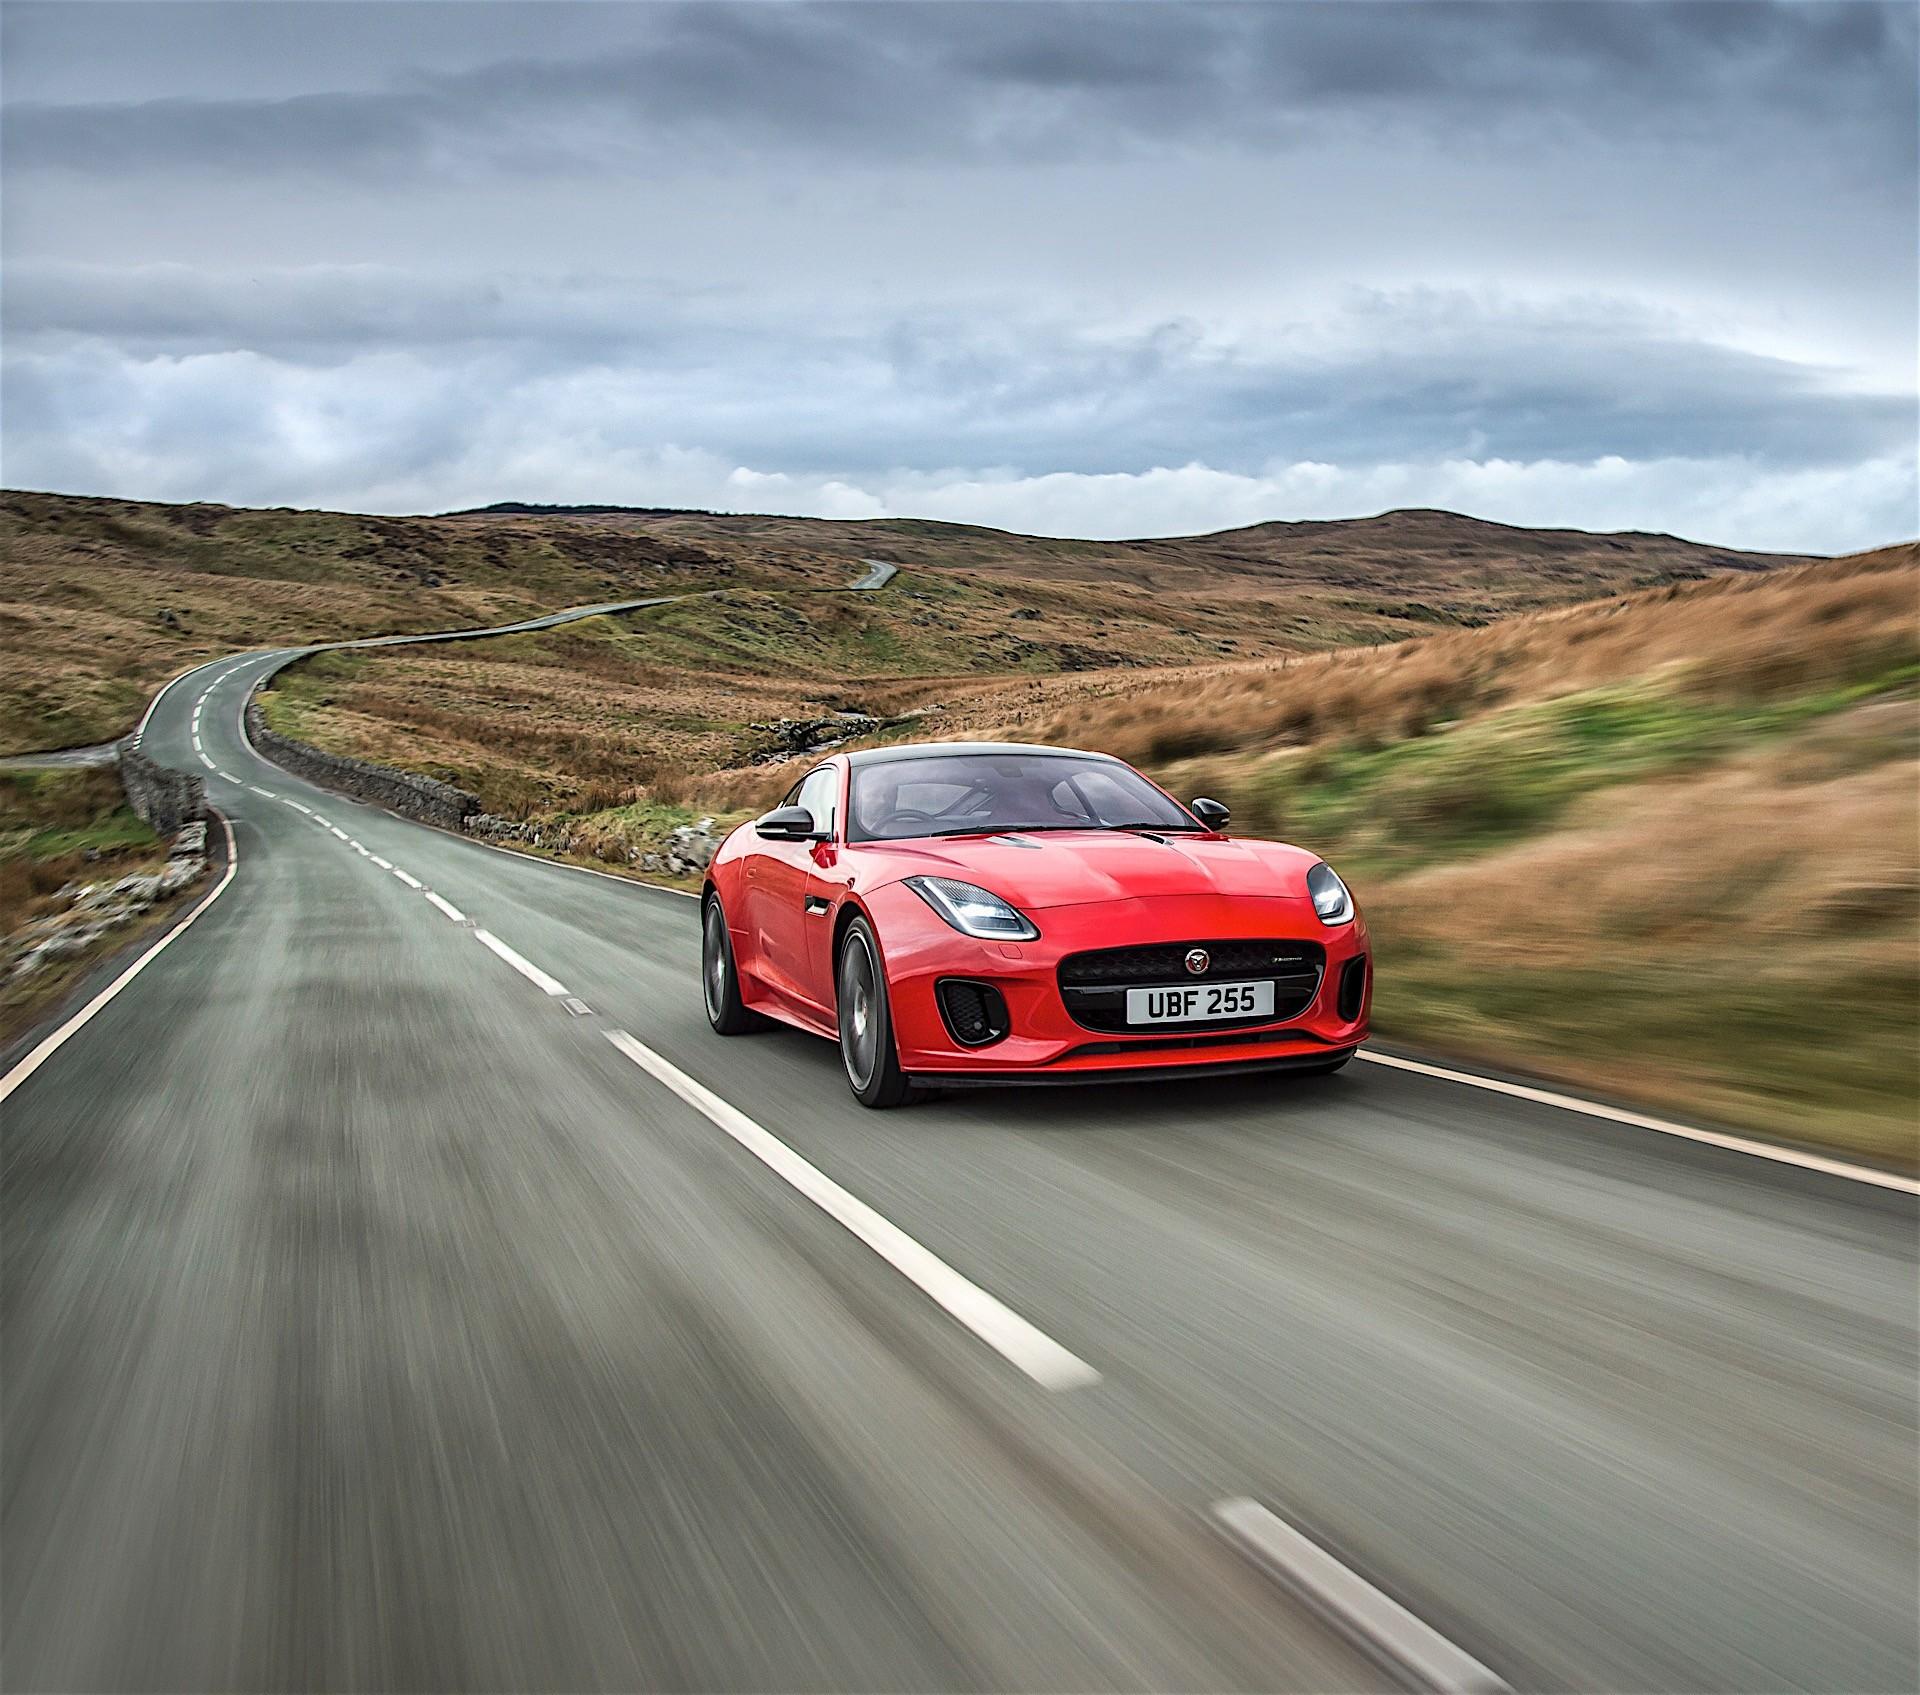 Used Jaguar F Type: Jaguar Land Rover Adopts Naming Convention That Makes More